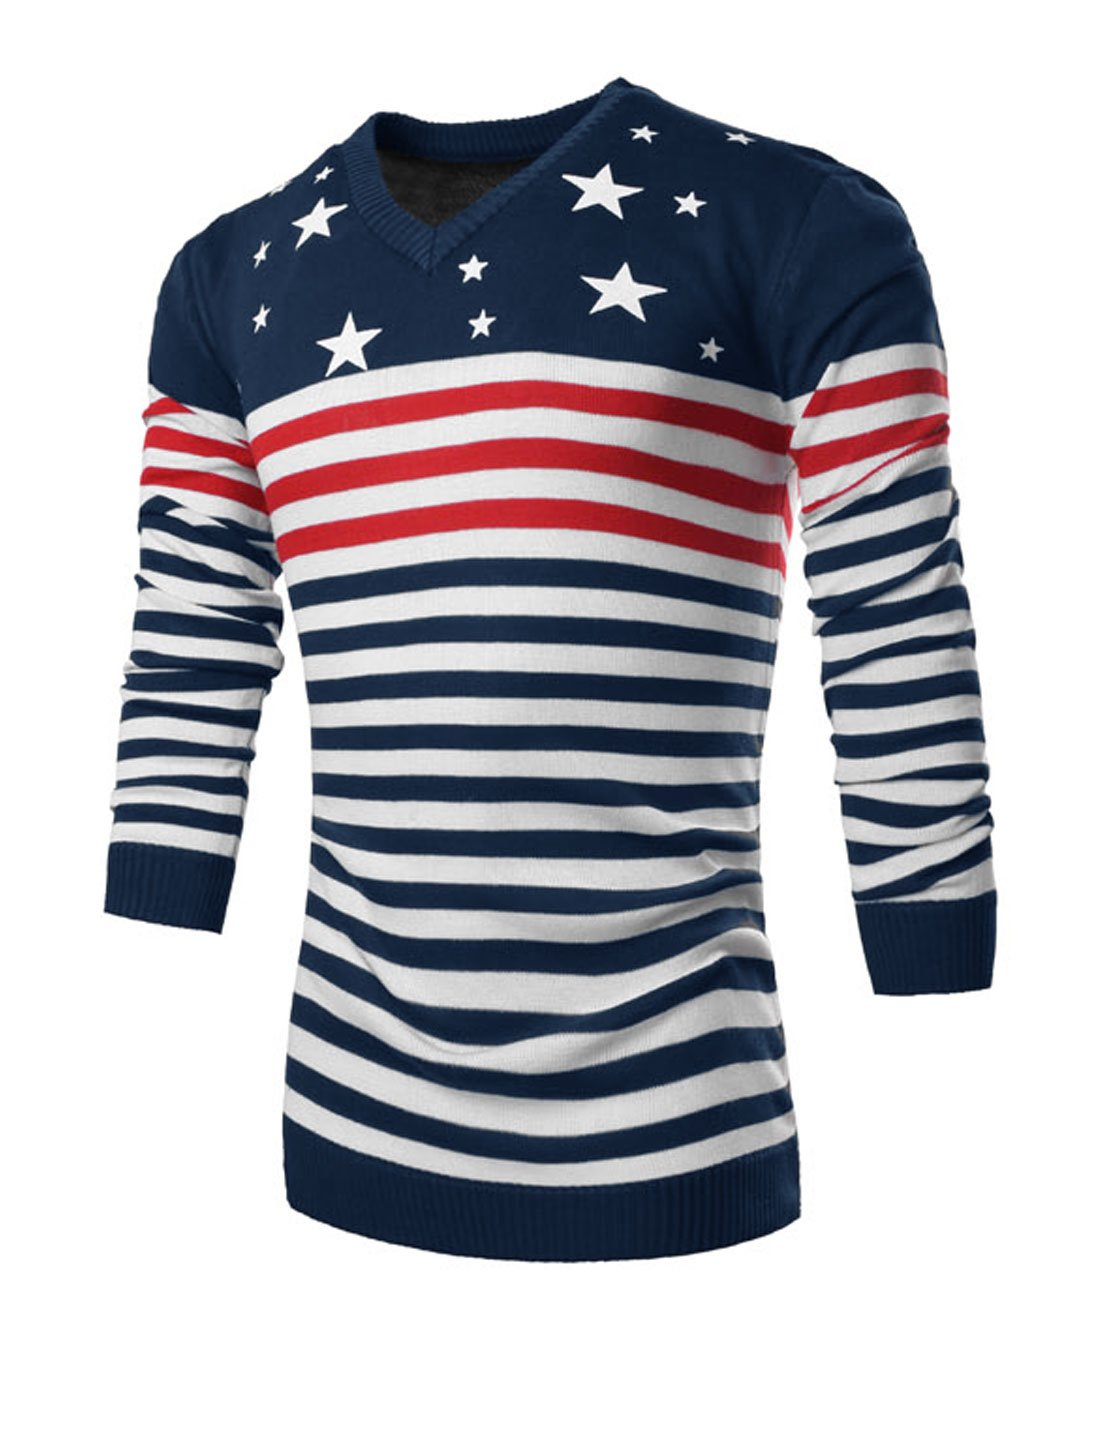 Men Pullover Long Sleeve Stripes Stars Print Knit Shirt Navy Blue Red M